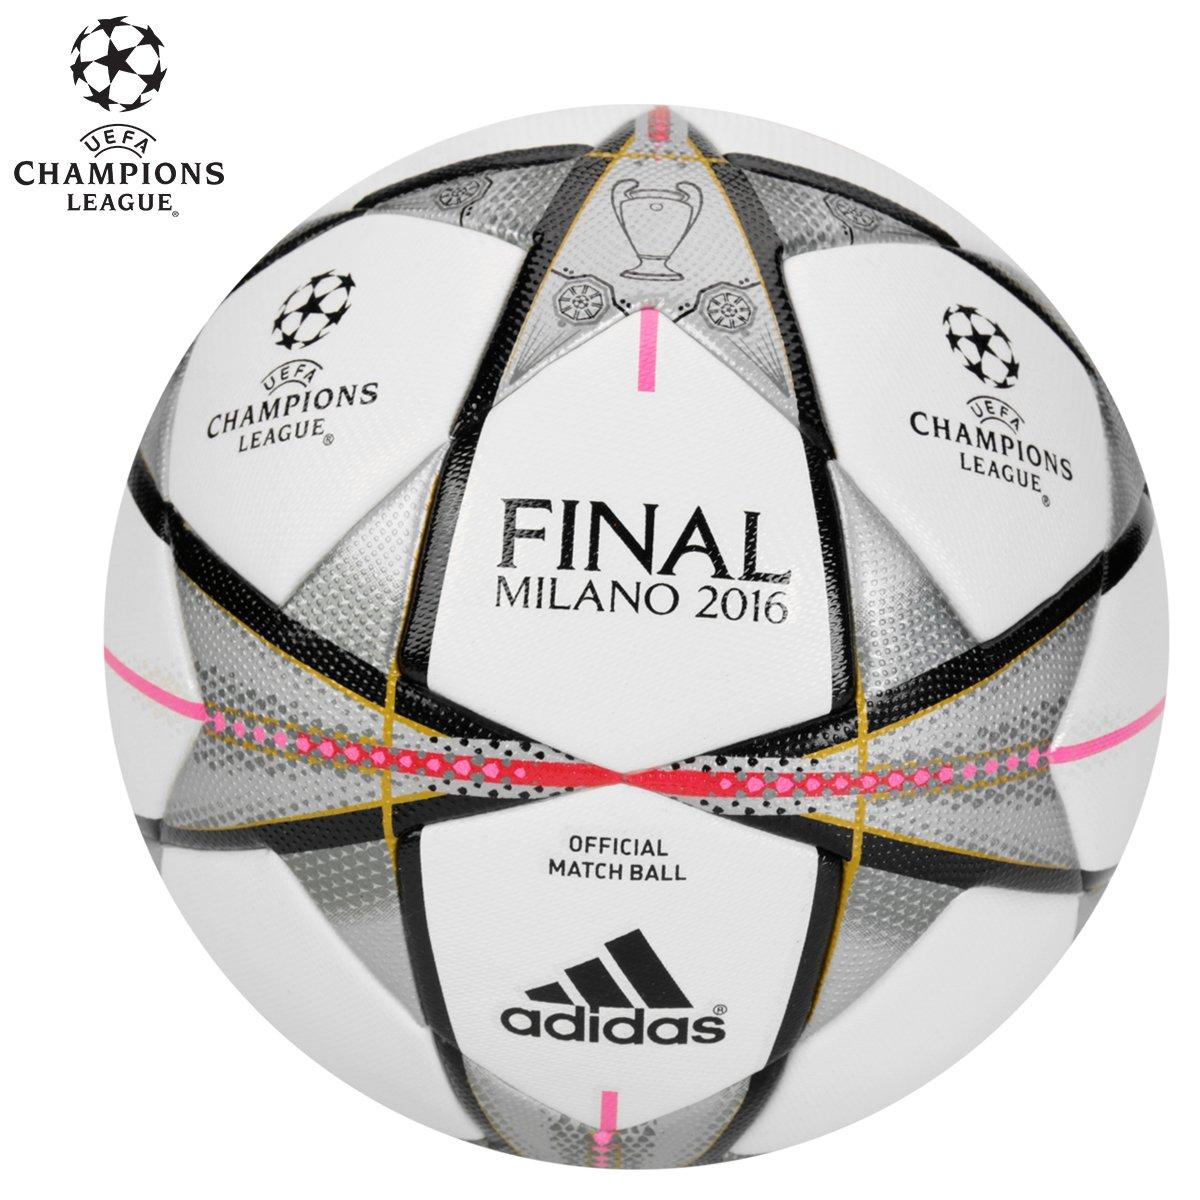 Bola Futebol Adidas Finale Milano 2016 OMB Oficial Campo - Compre Agora  a10f6b56a8154